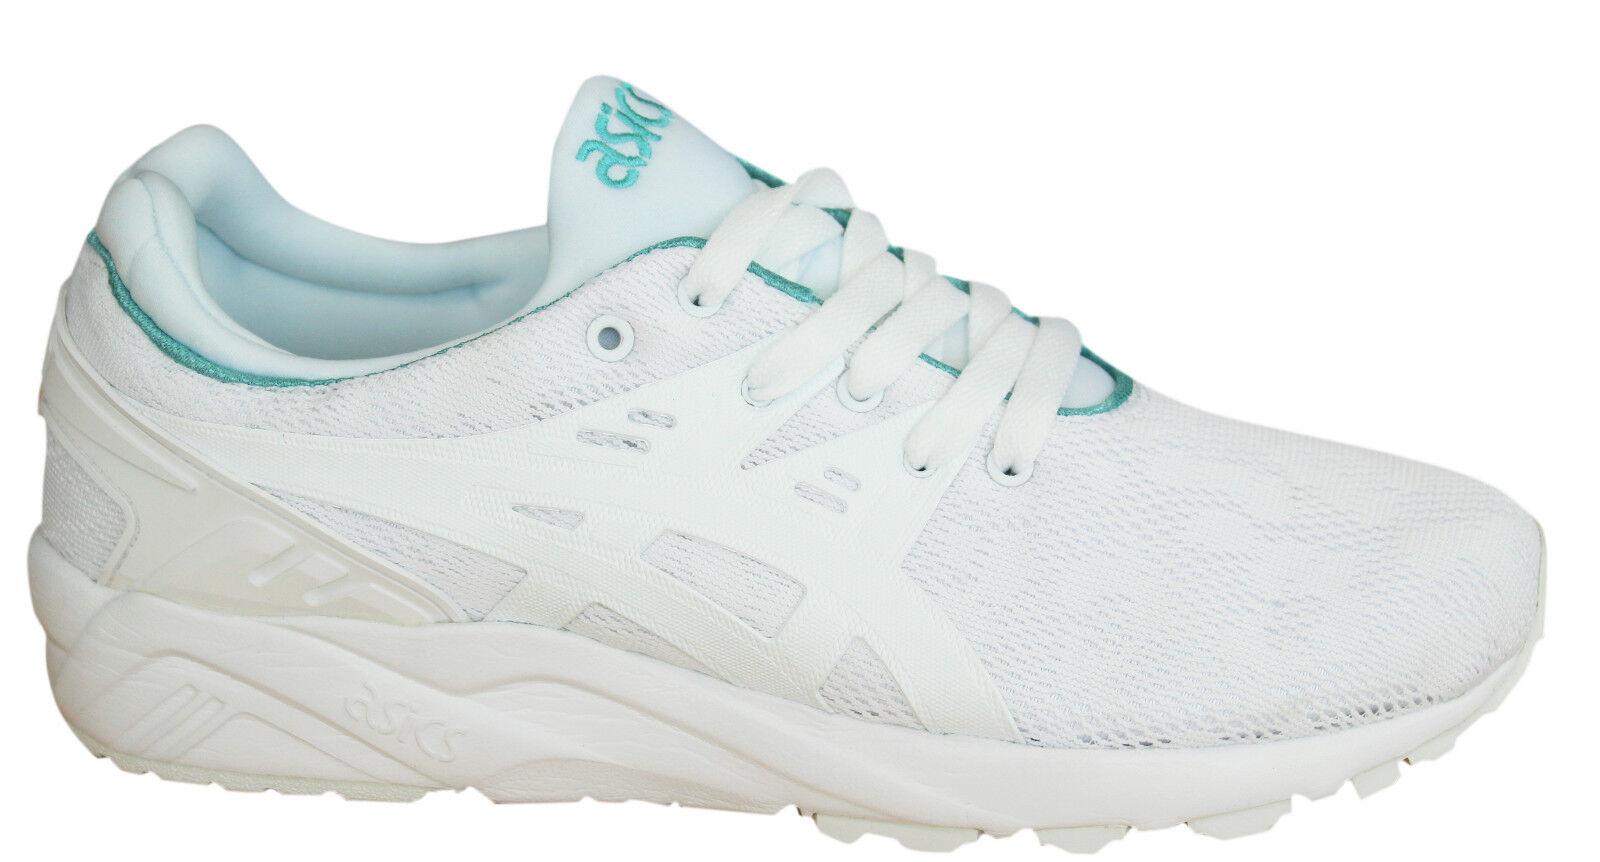 Asics Gel-Kayano Trainers Evo Damenschuhe Schuhes Lace Up Textile Wei  H7Q6N 0101 M4